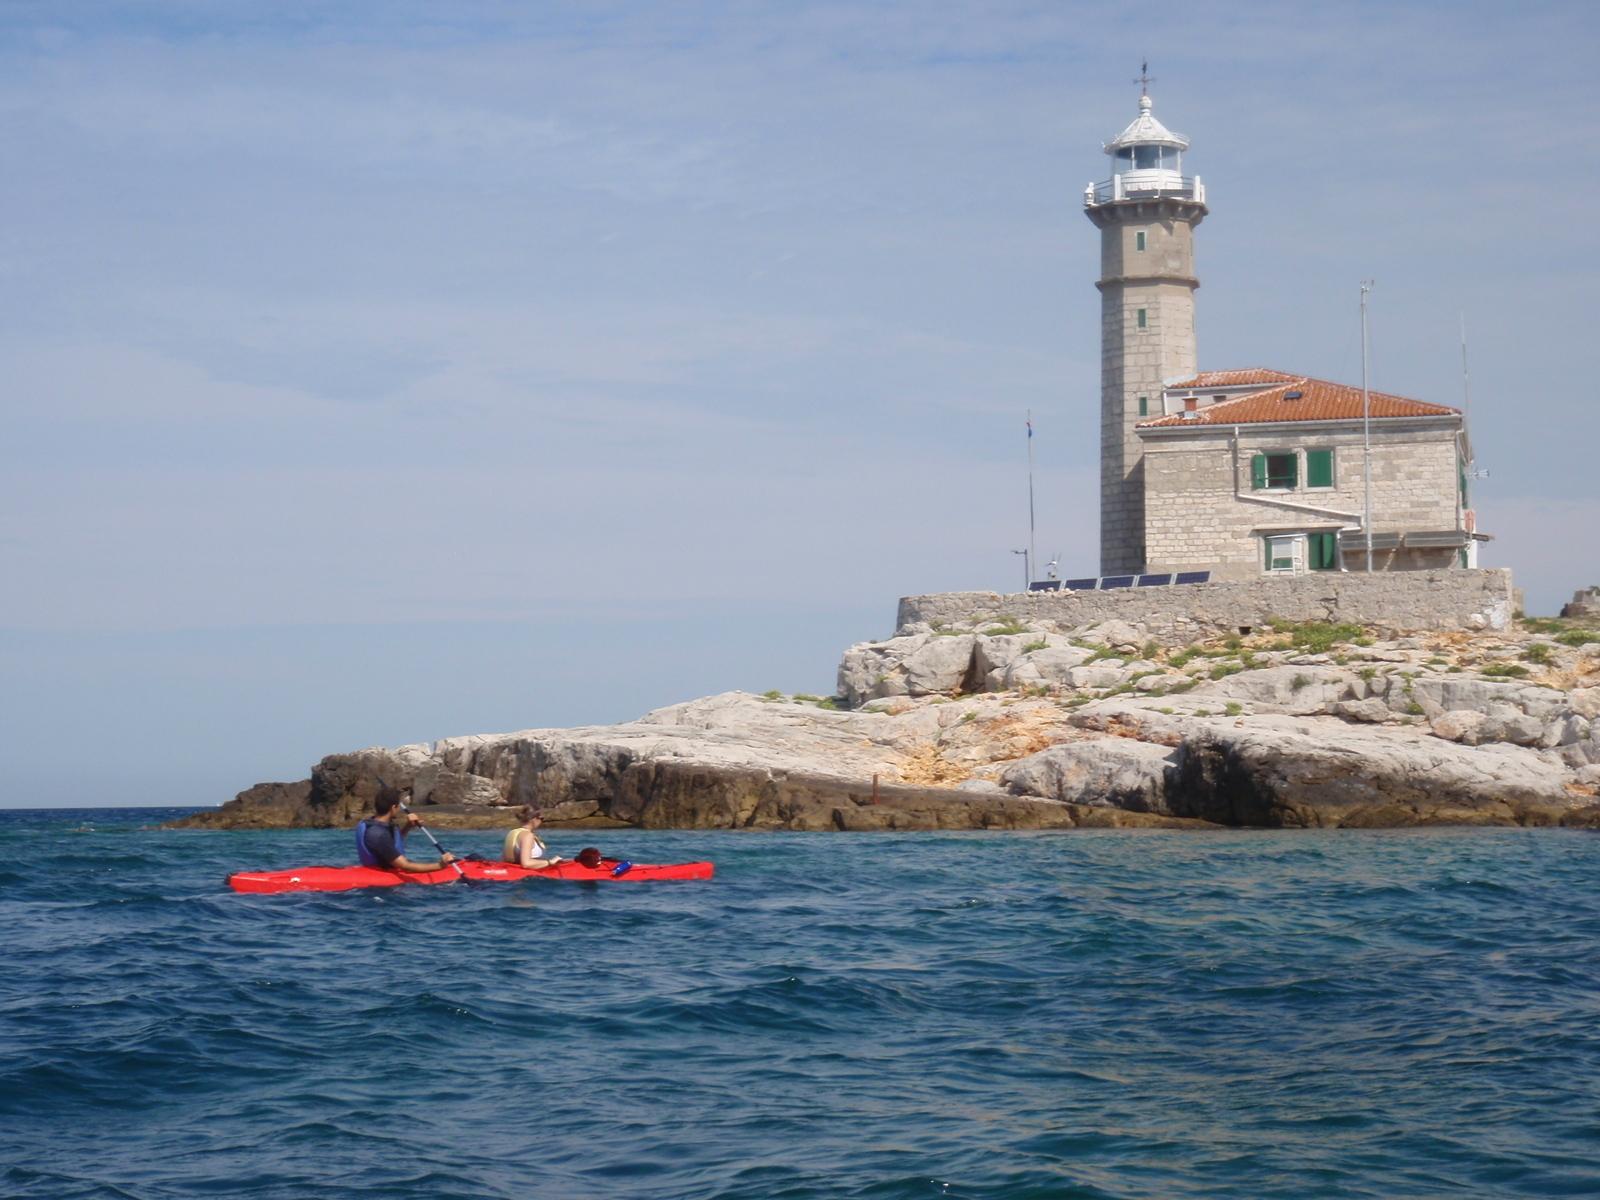 Tour Rovinj's islands by kayak